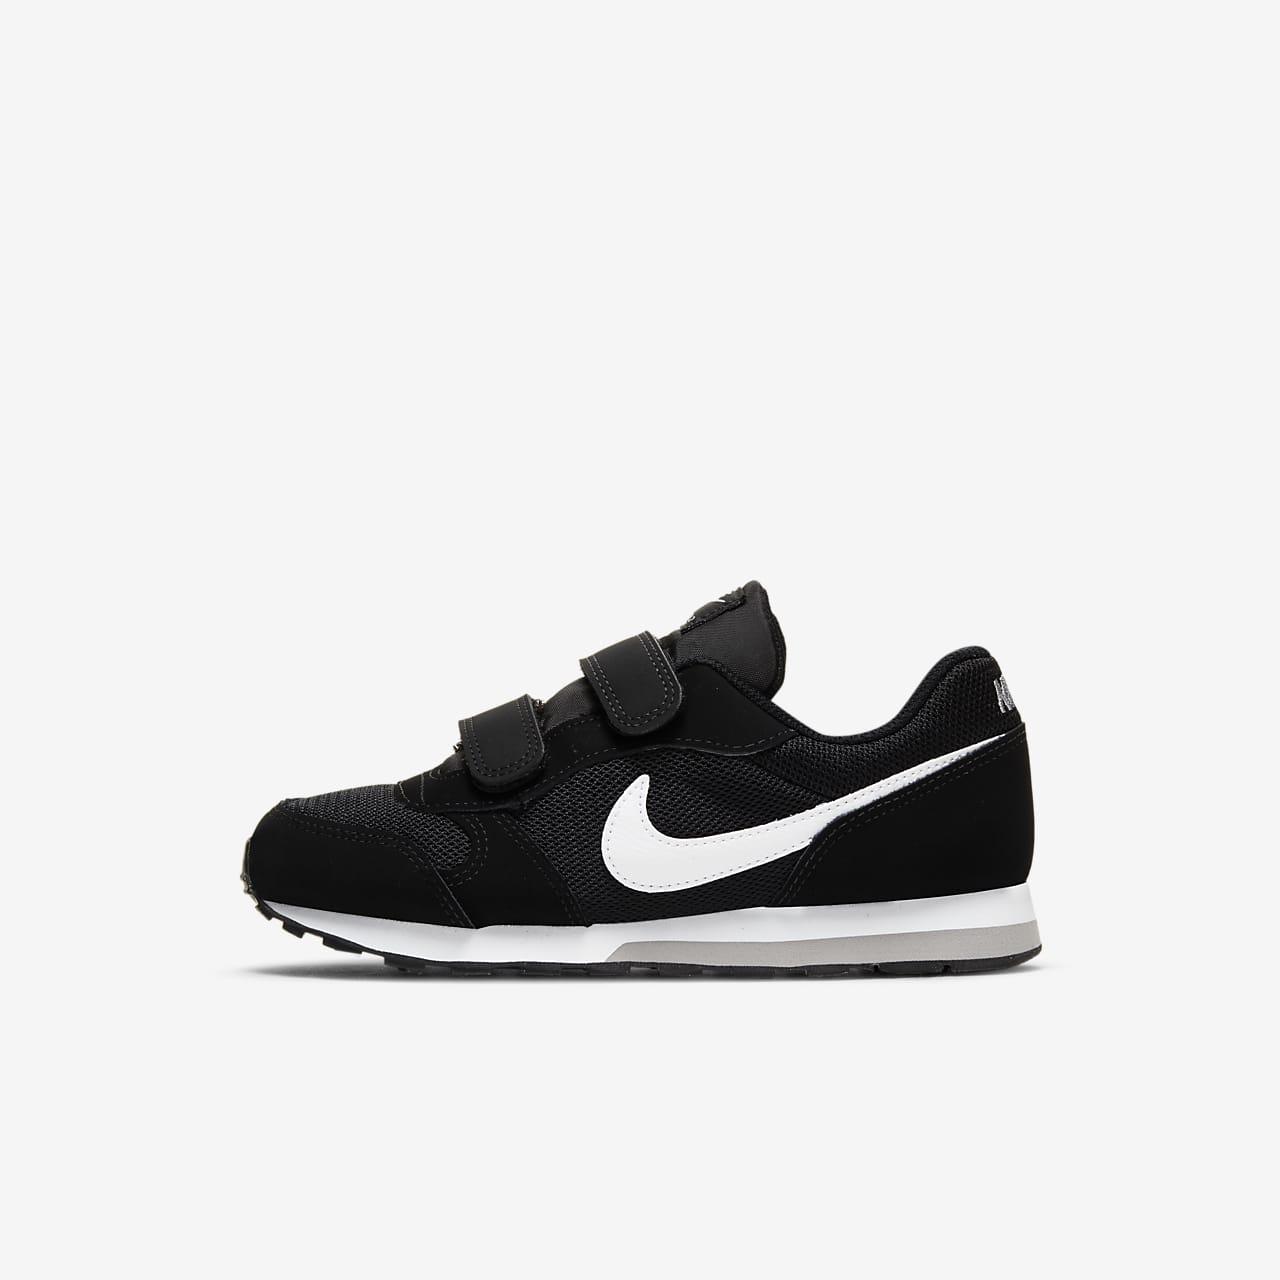 Bota Nike MD Runner 2 pro malé děti